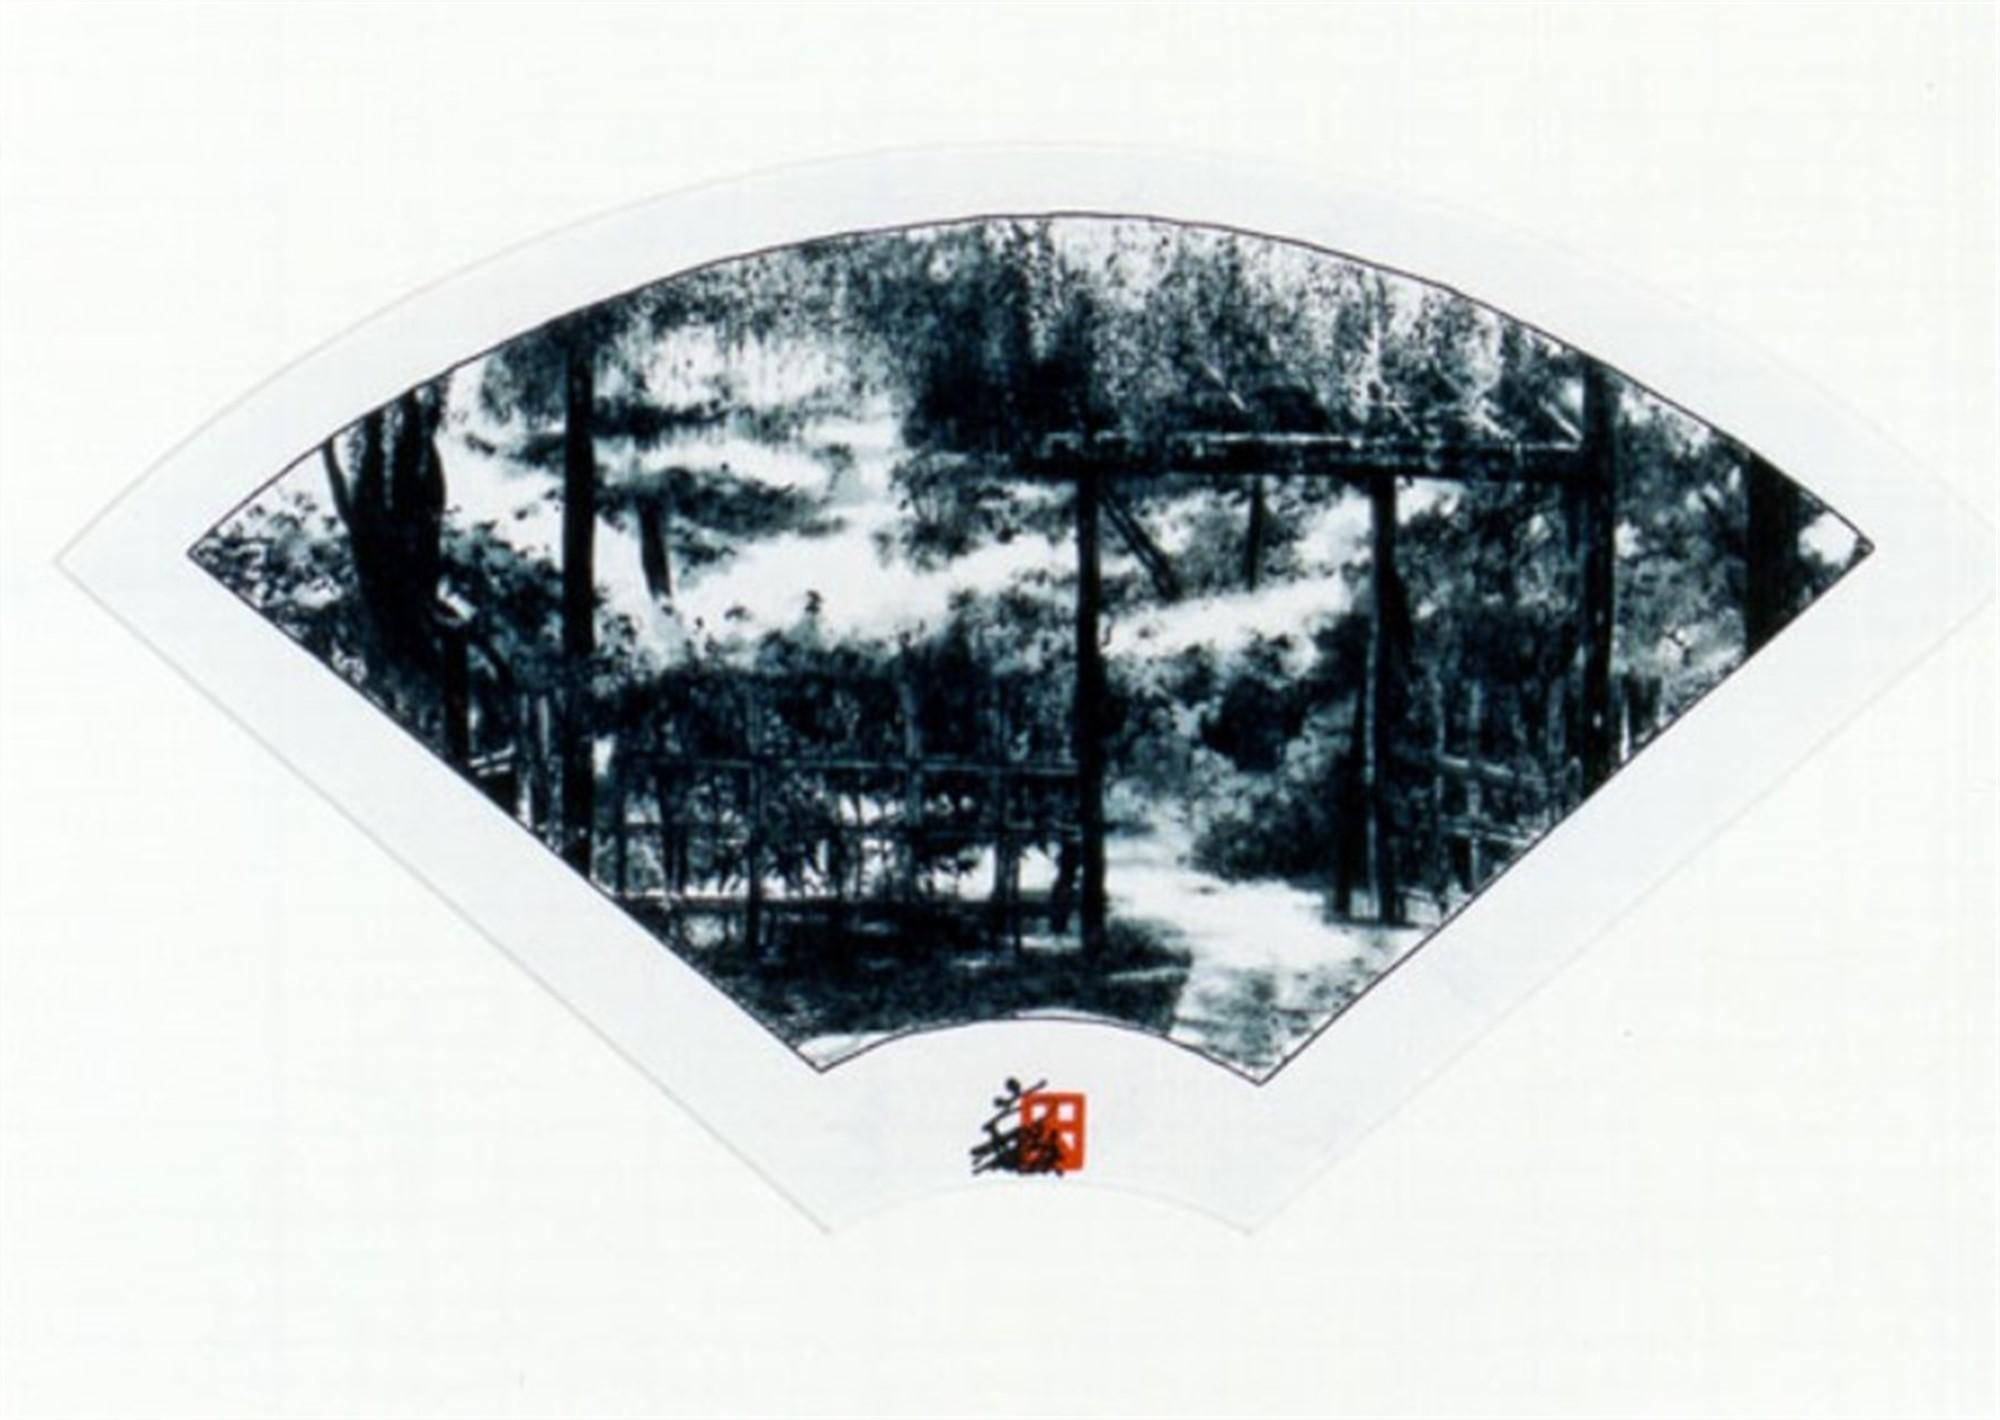 B/W Fan - Gate by Hisashi Otsuka